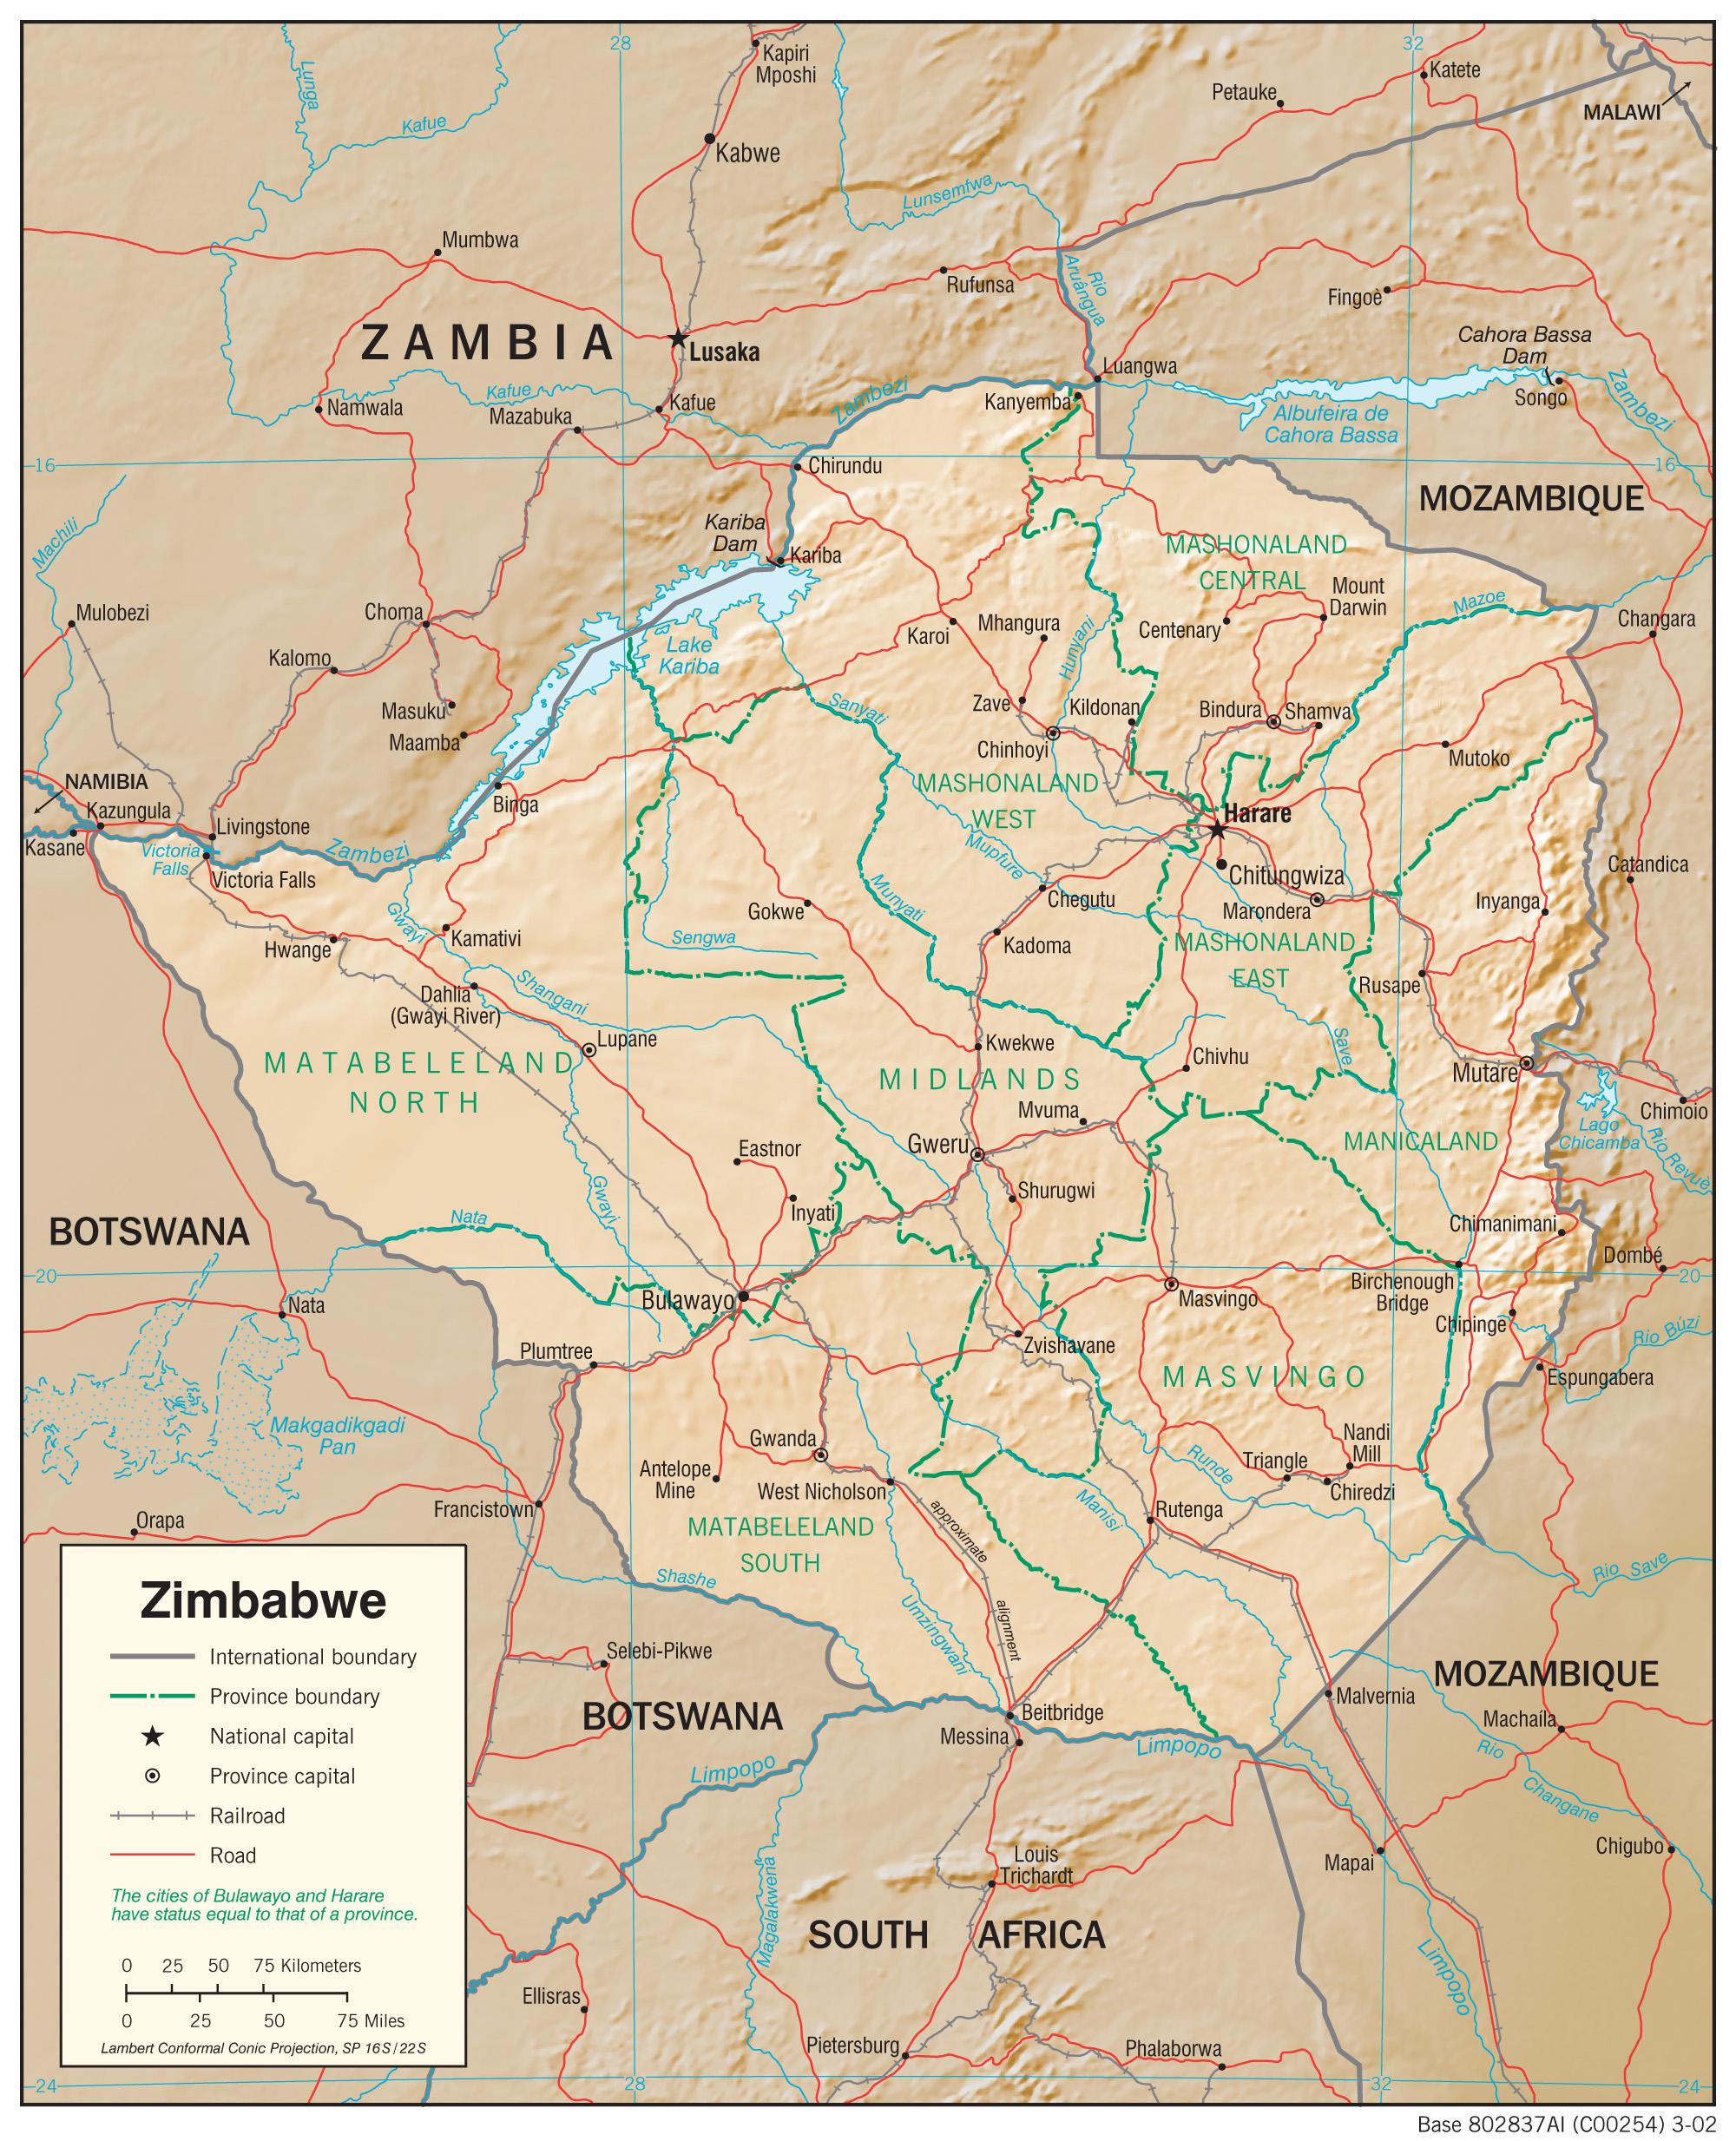 Zimbabwe maps perry castaeda map collection ut library online zimbabwe maps gumiabroncs Image collections